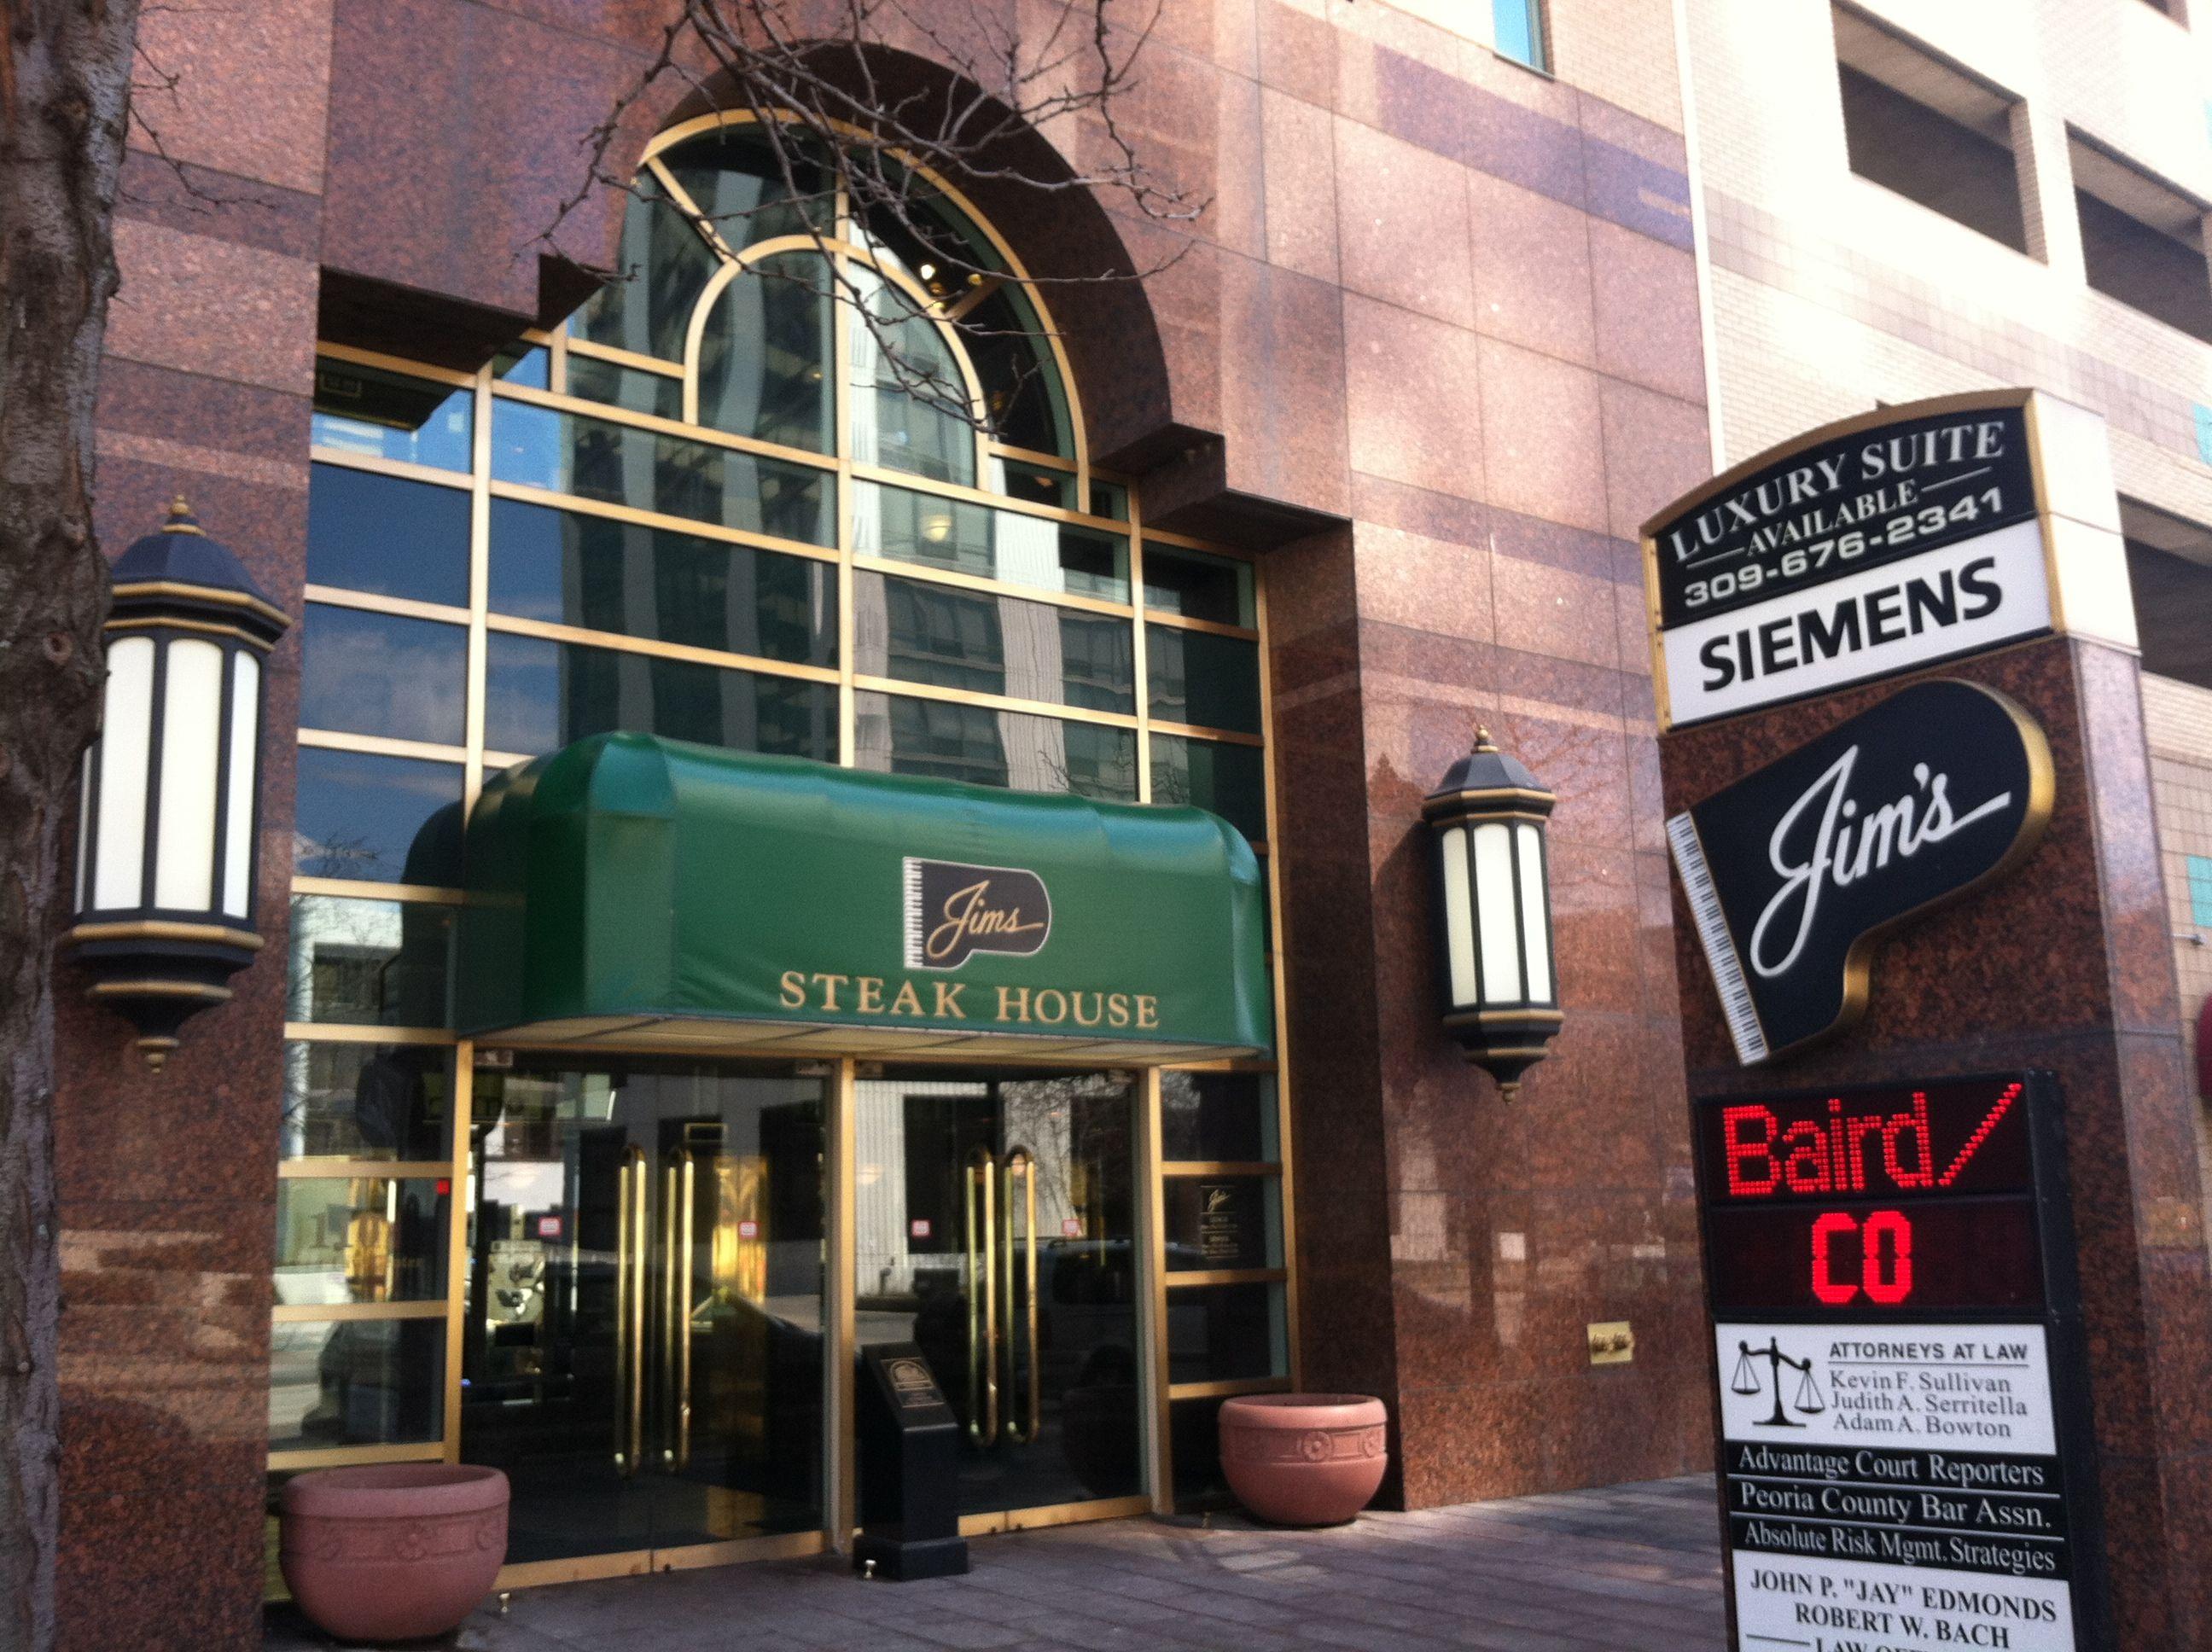 Jim S Steakhouse In Downtown Peoria Illinois